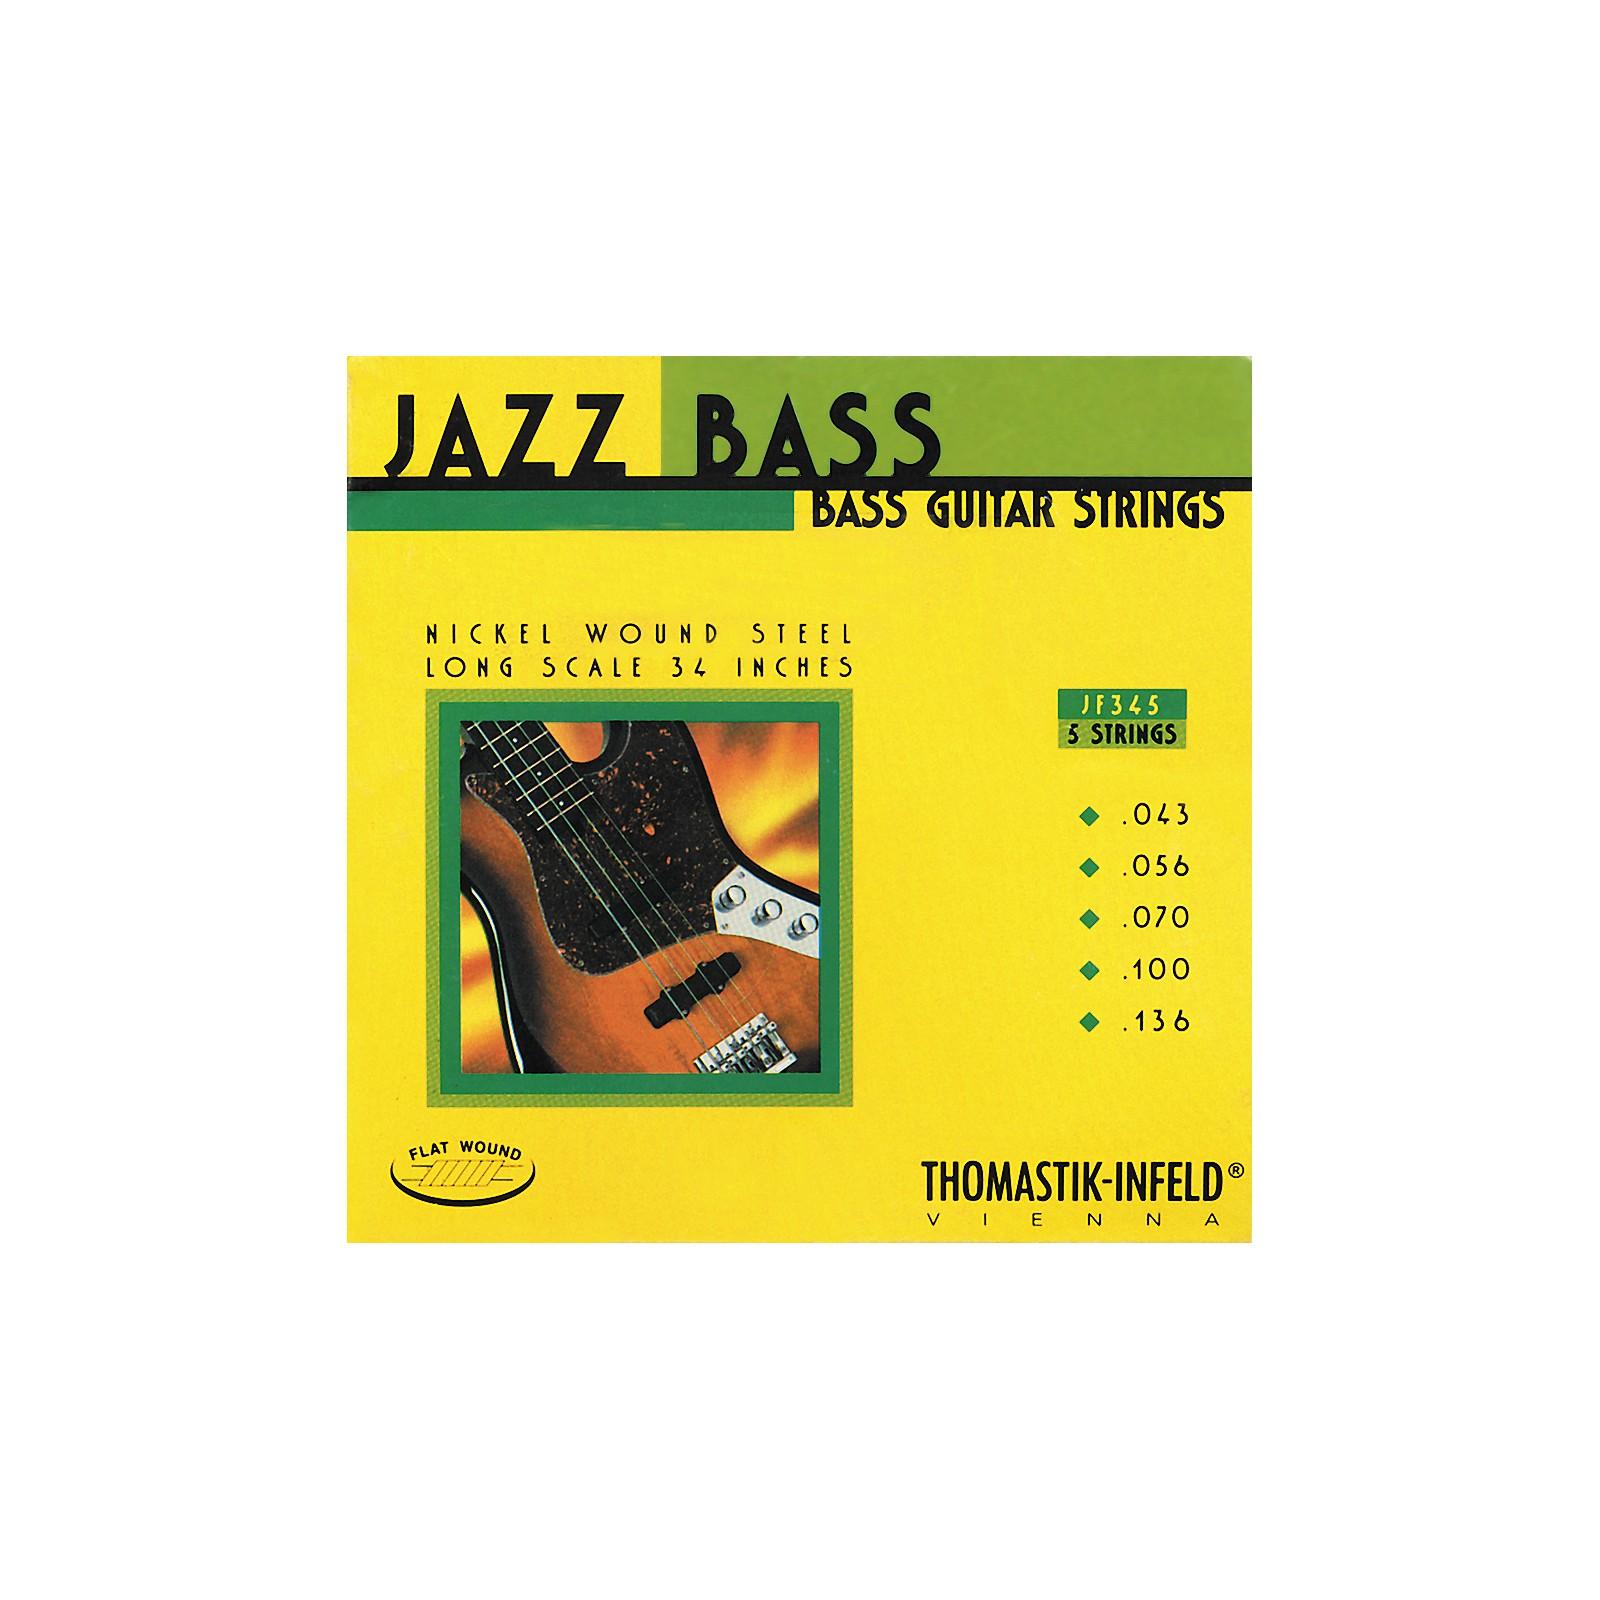 Thomastik JF345 Flatwound 5-String Jazz Bass Strings